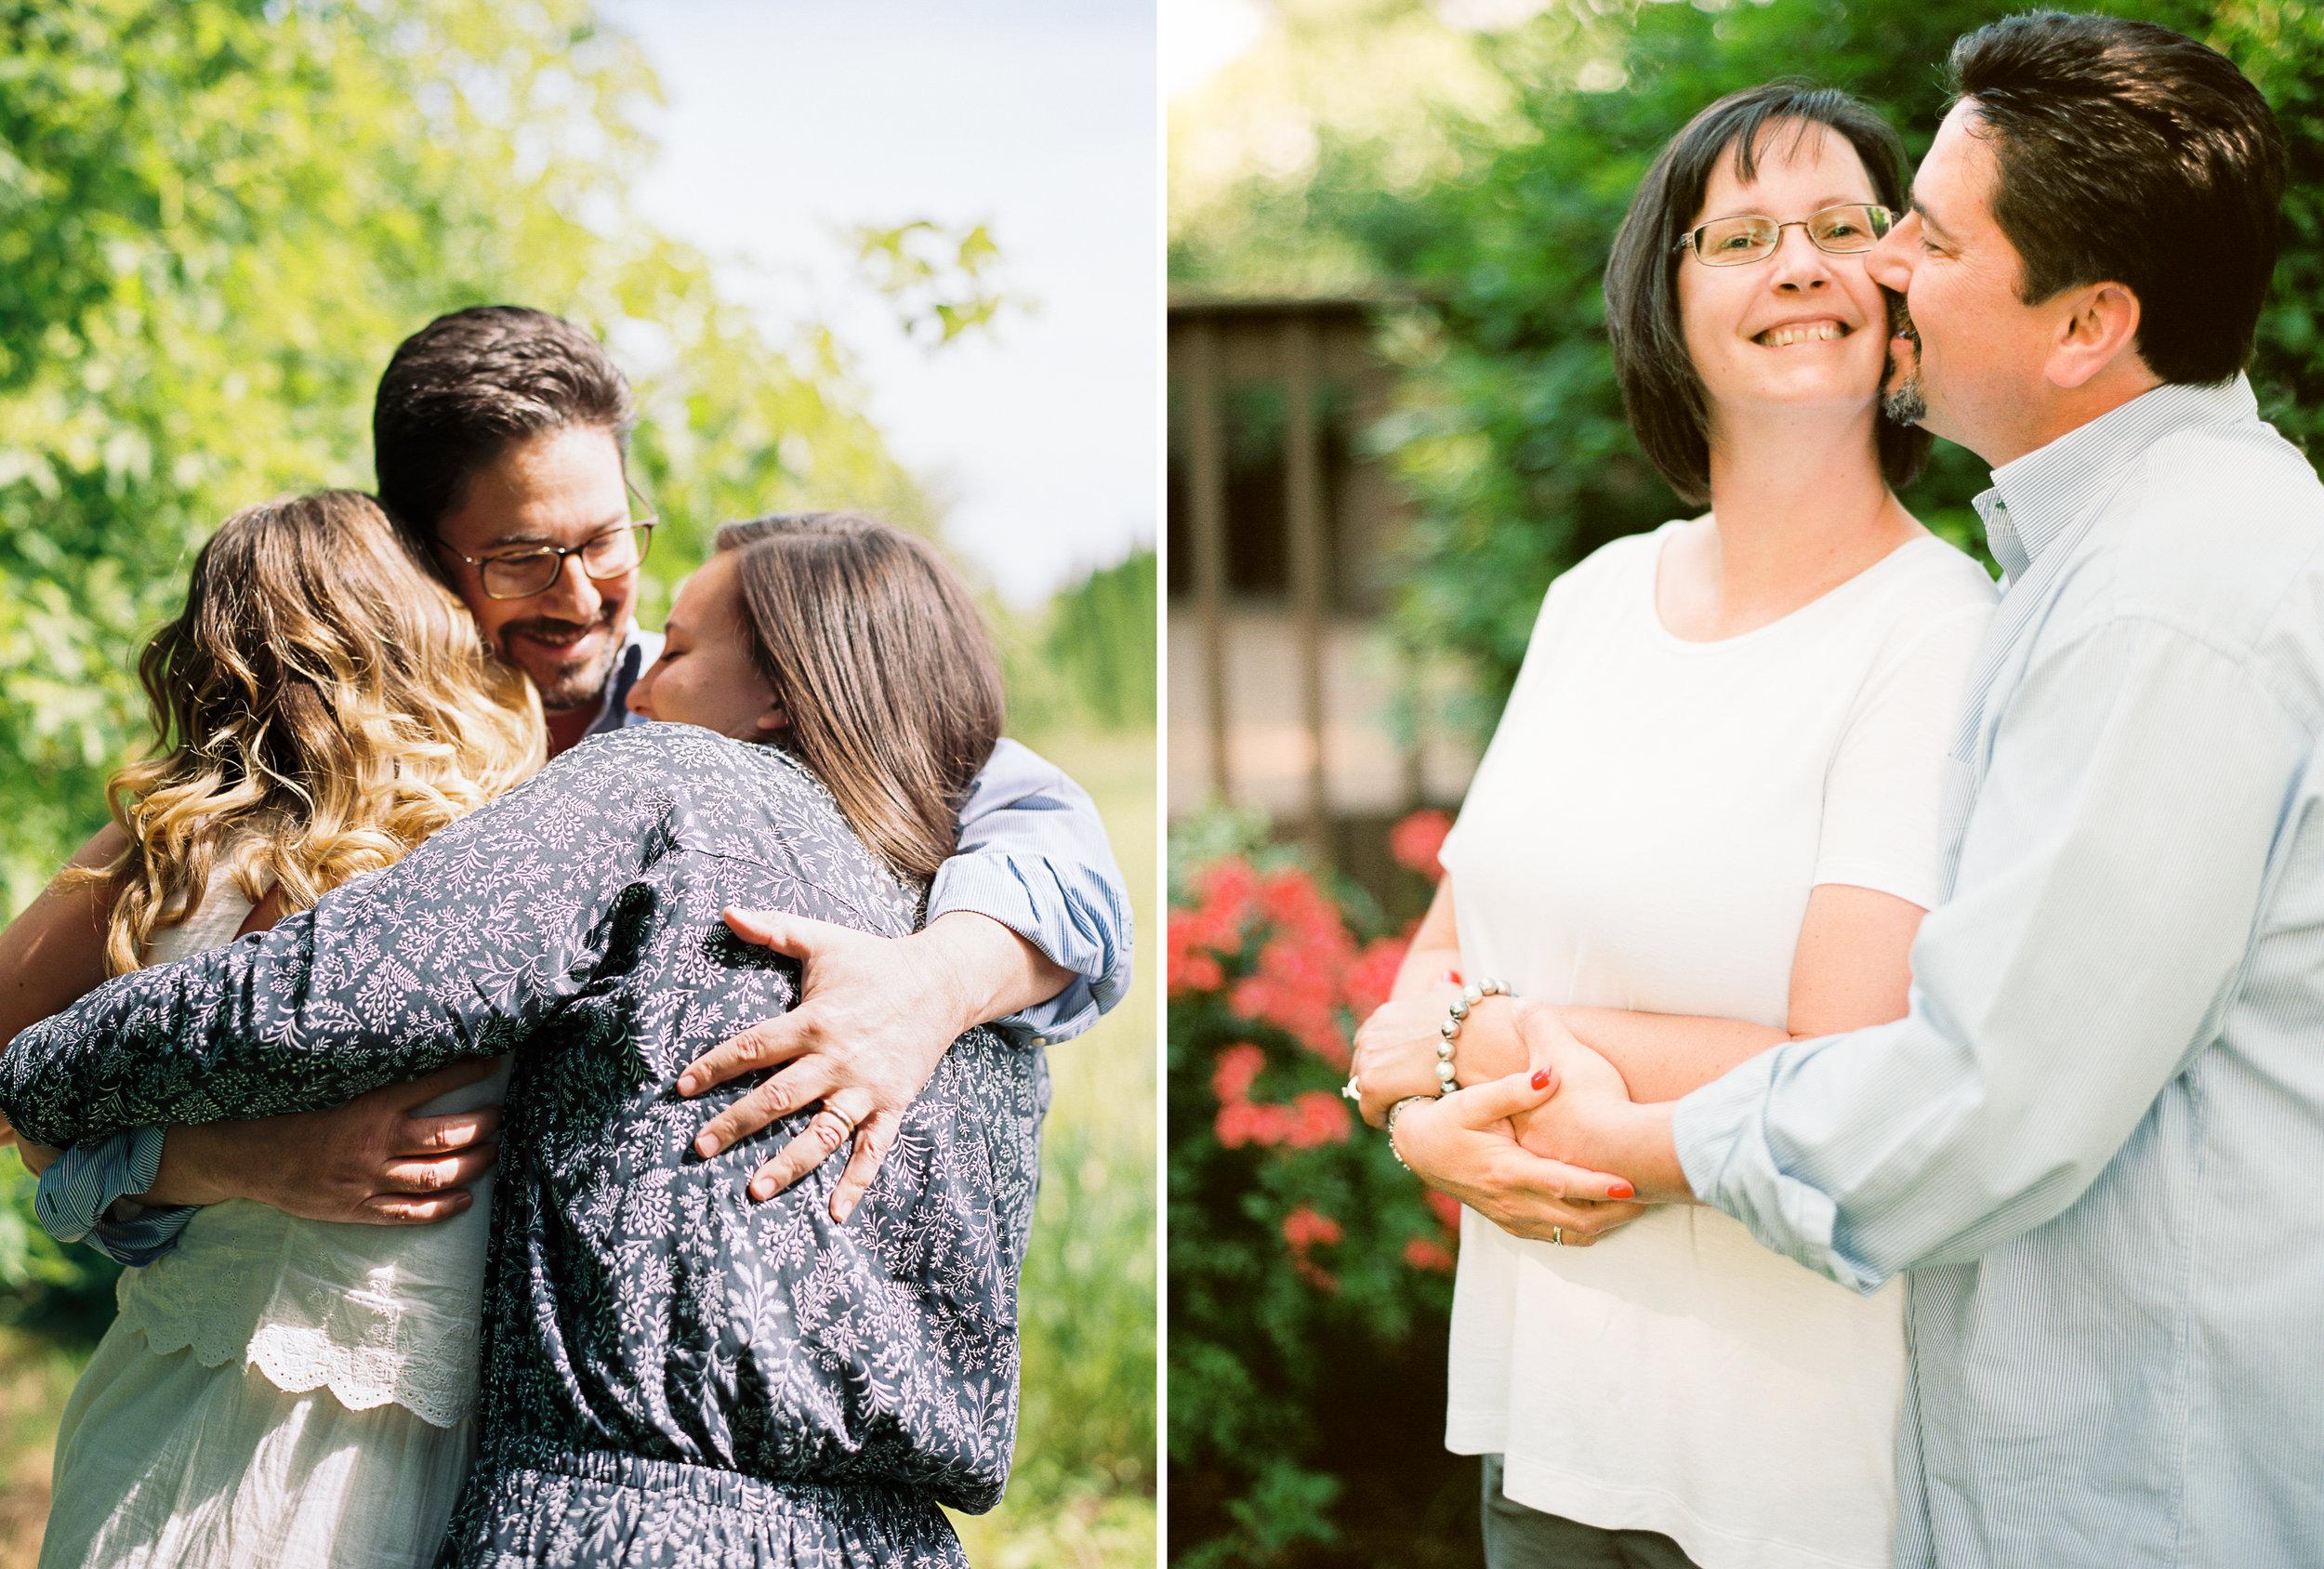 illinois family photographer Catie Scott Studio Film contax 645_5.jpg